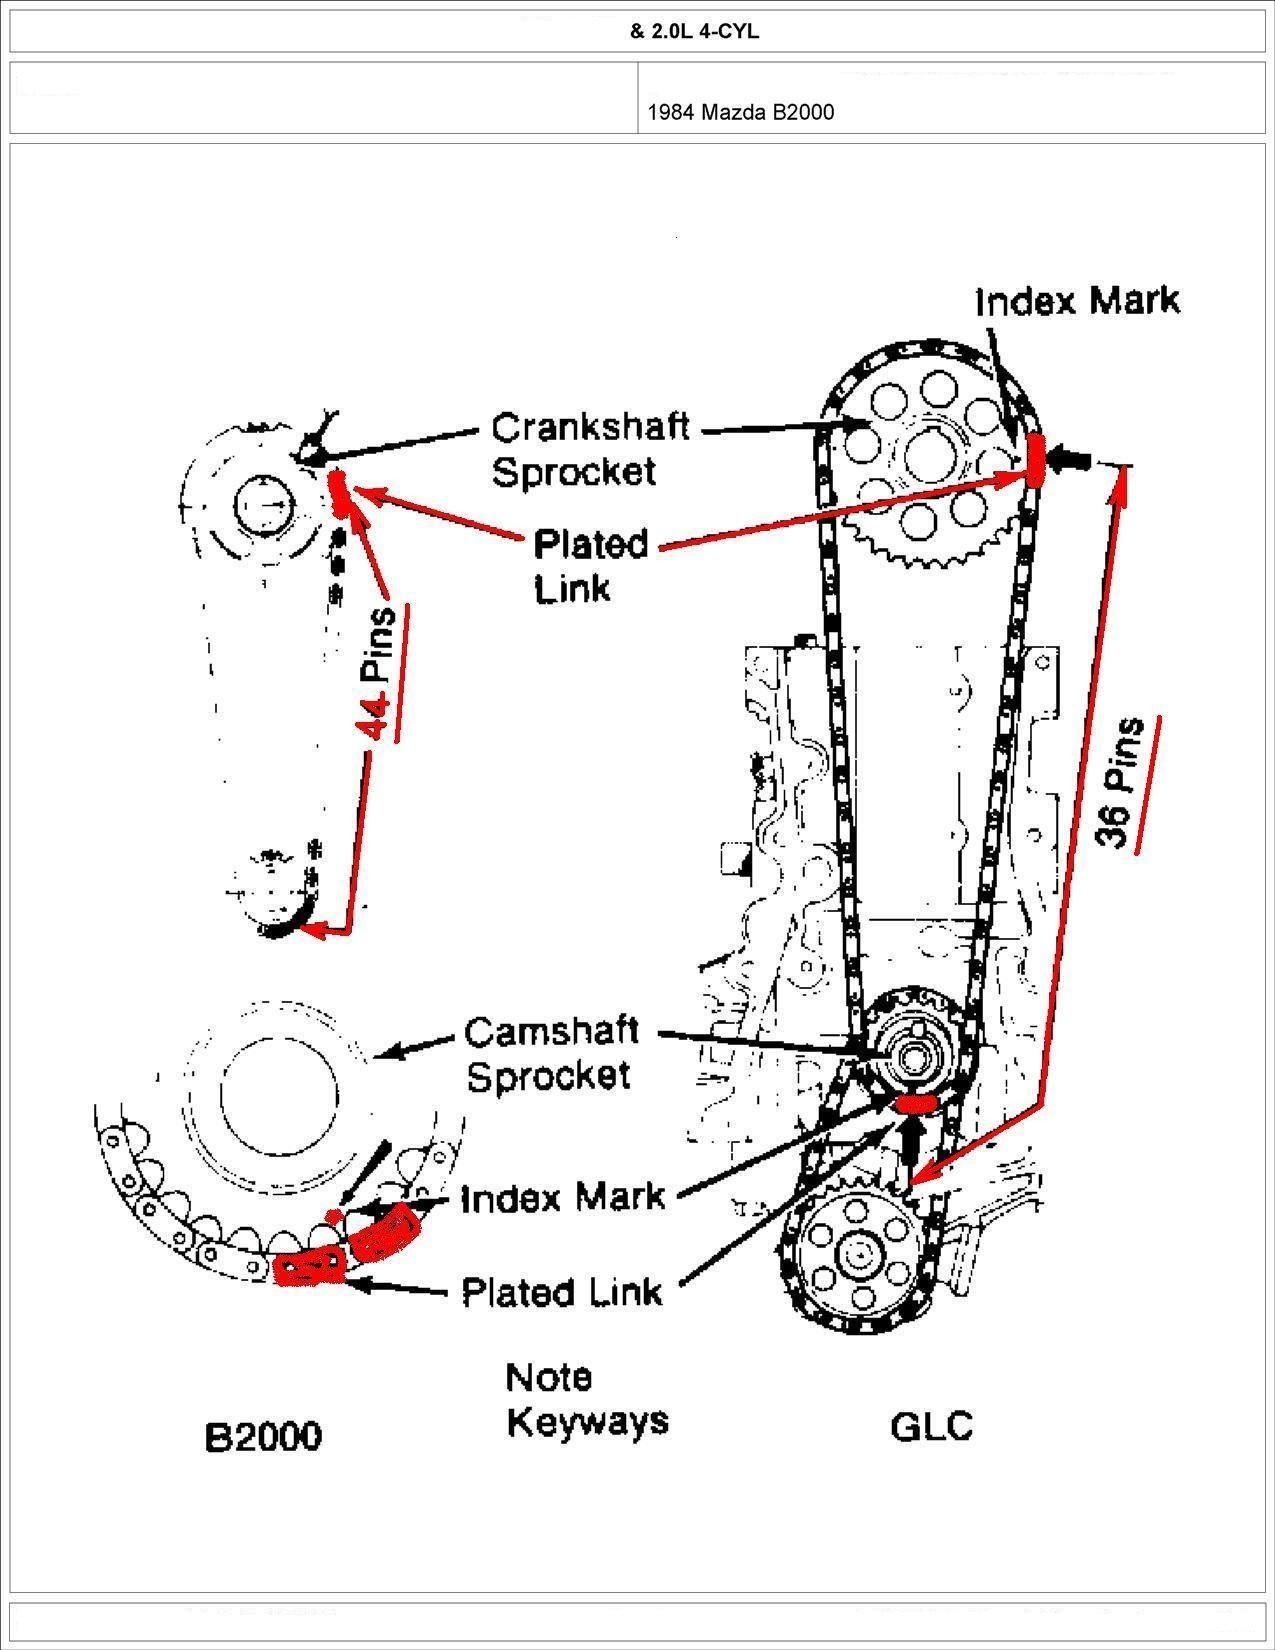 Port Timing Diagram Of Diesel Engine Engine Valve Timing